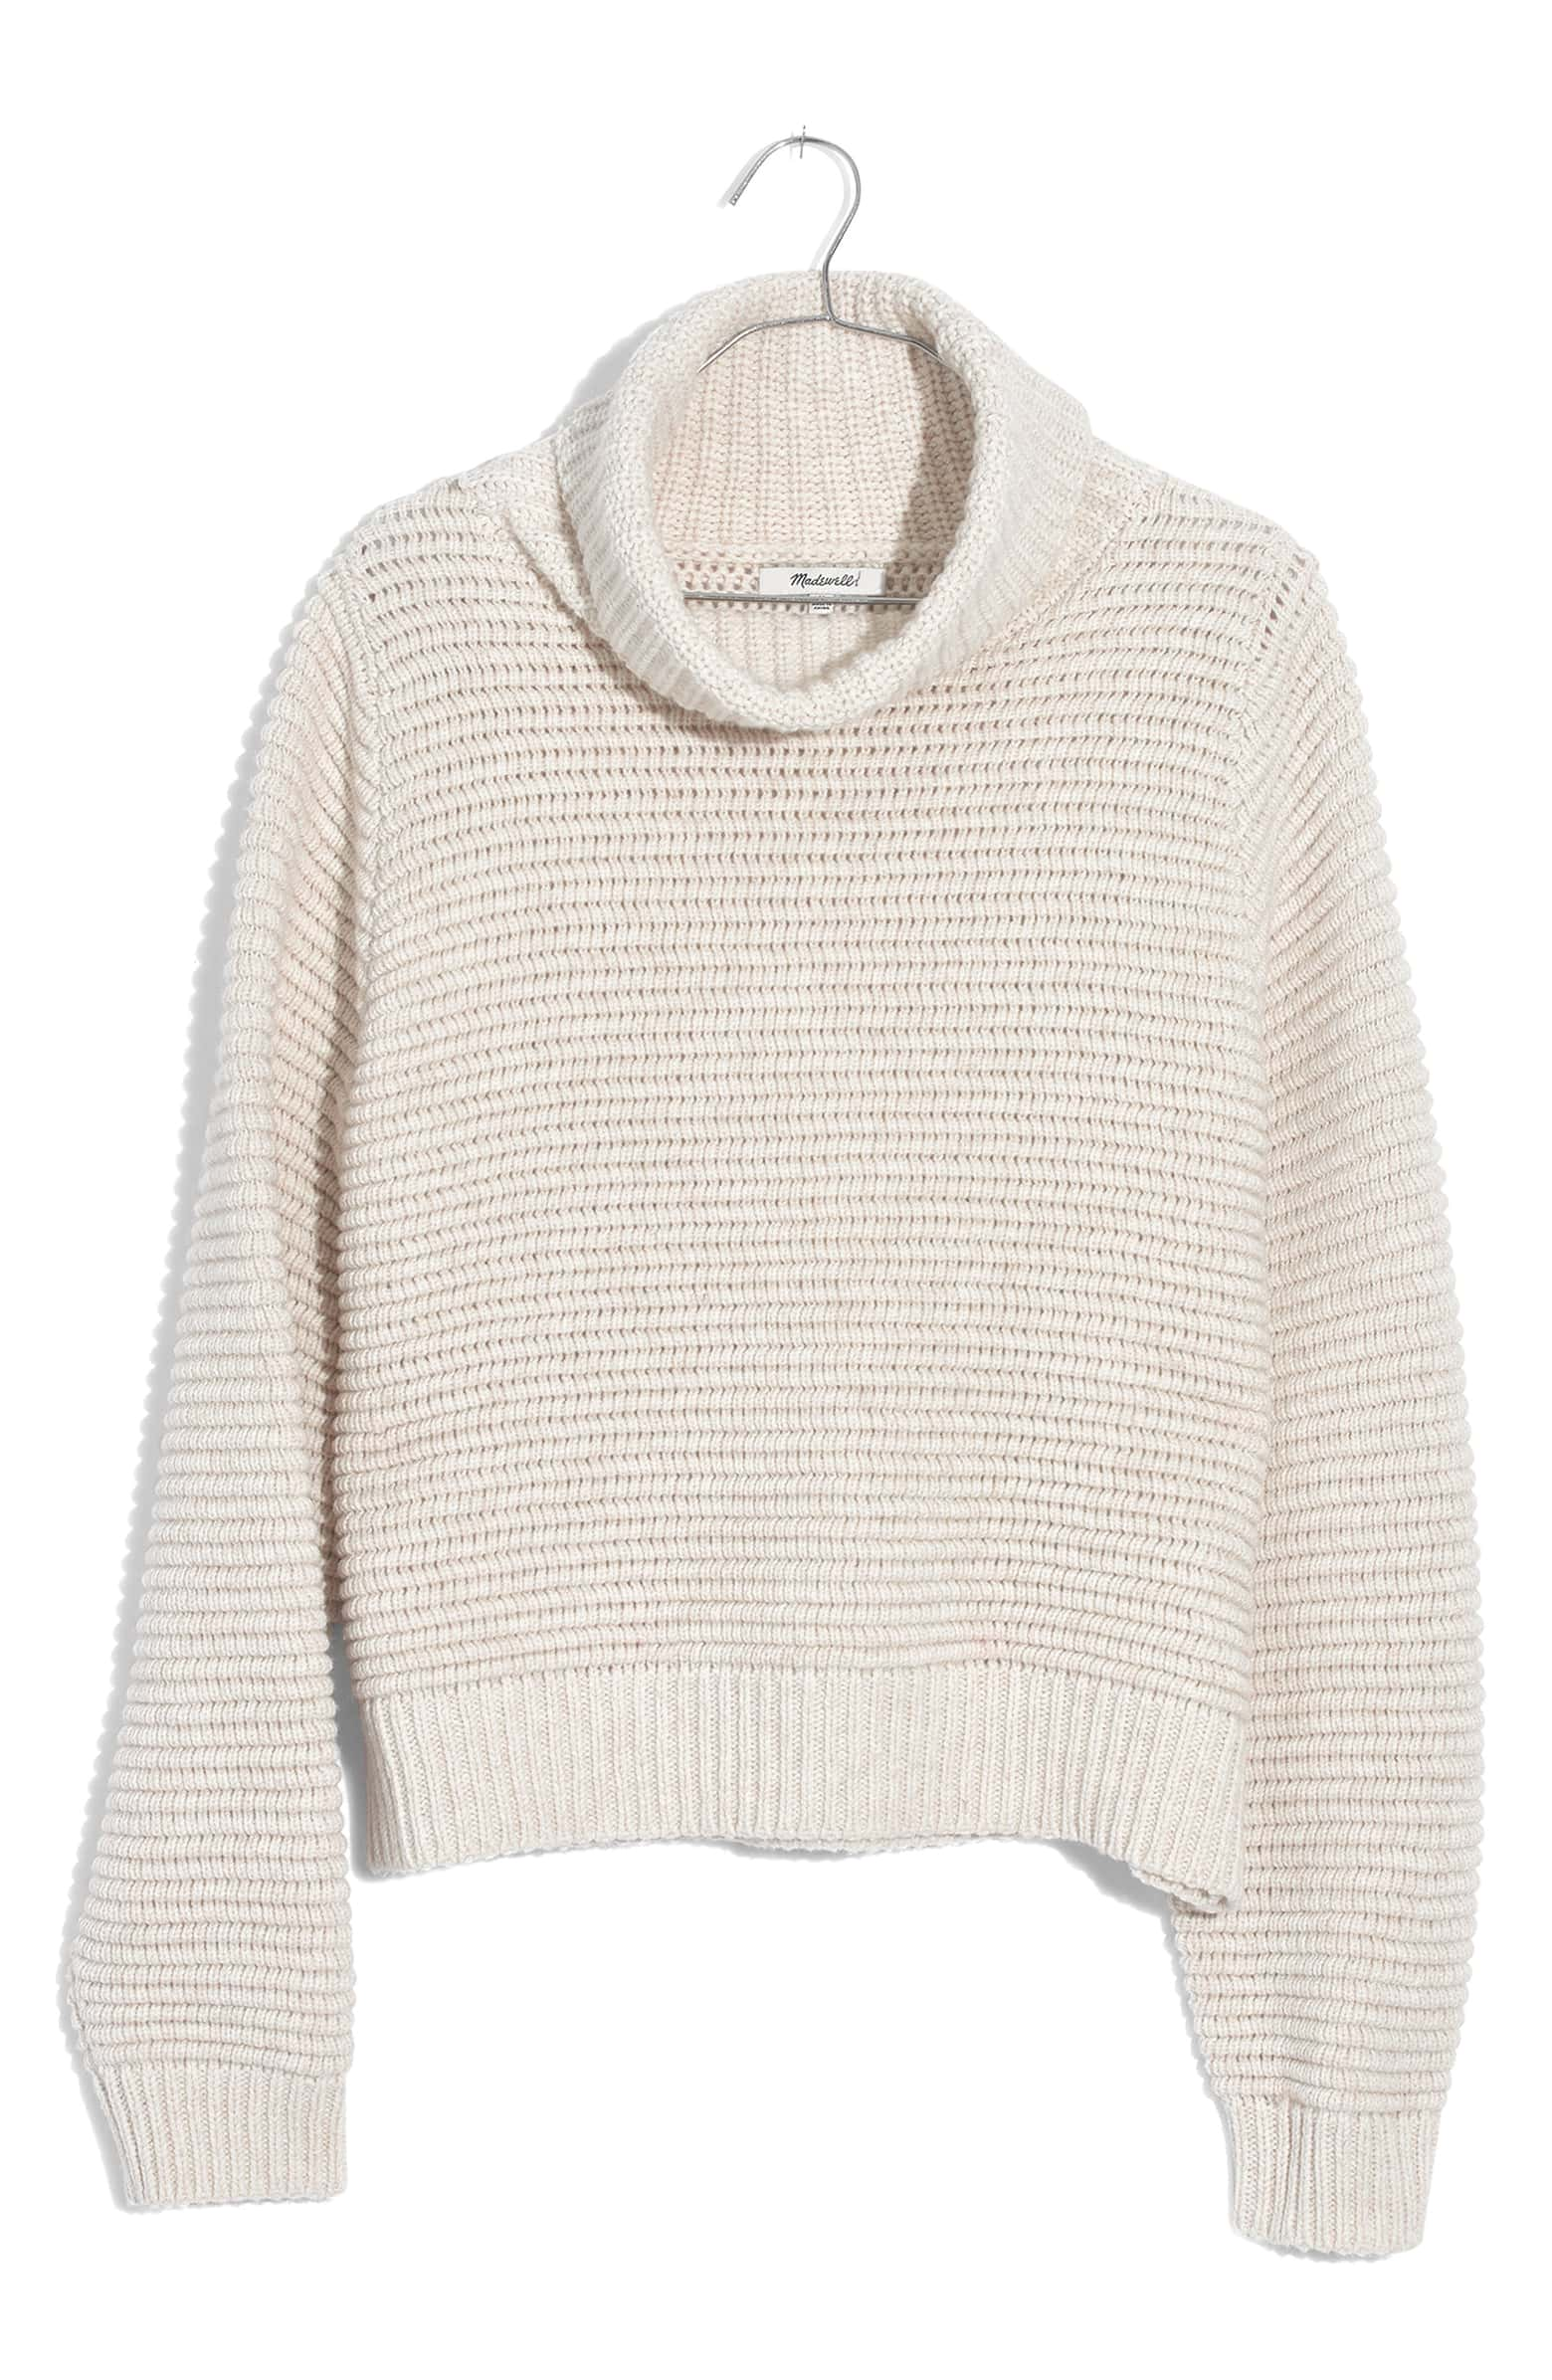 madewell-sweater